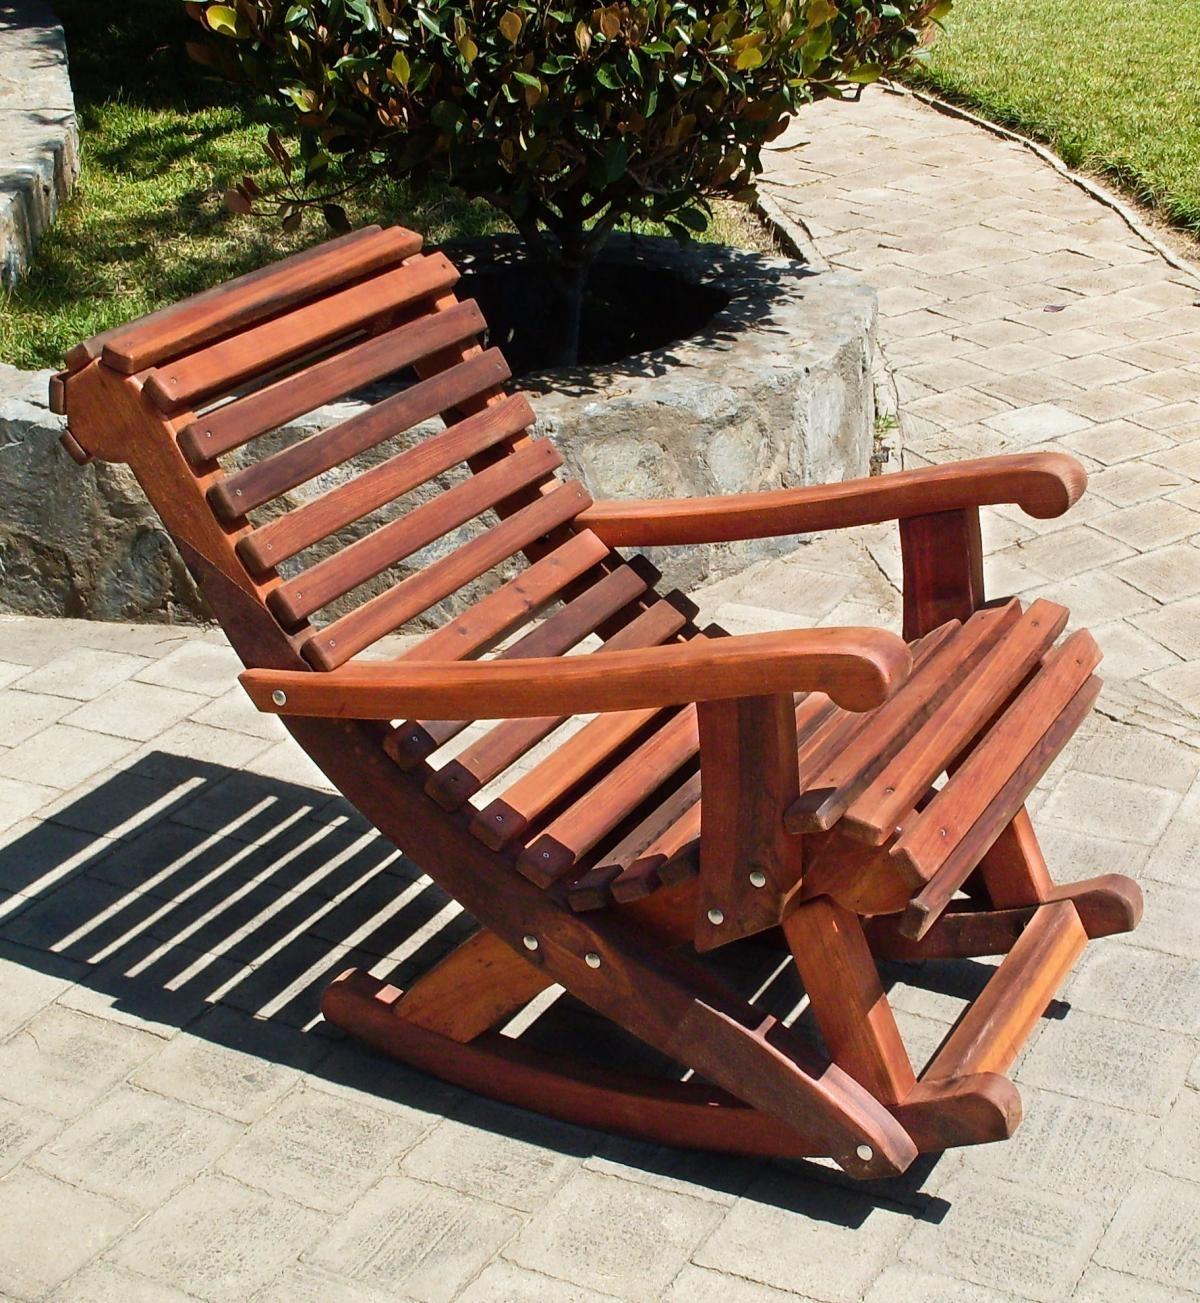 Cozy Outdoor Wooden Rocking Chairs : Pleasure Outdoor Wooden Rocking Throughout Rocking Chair Outdoor Wooden (View 5 of 15)